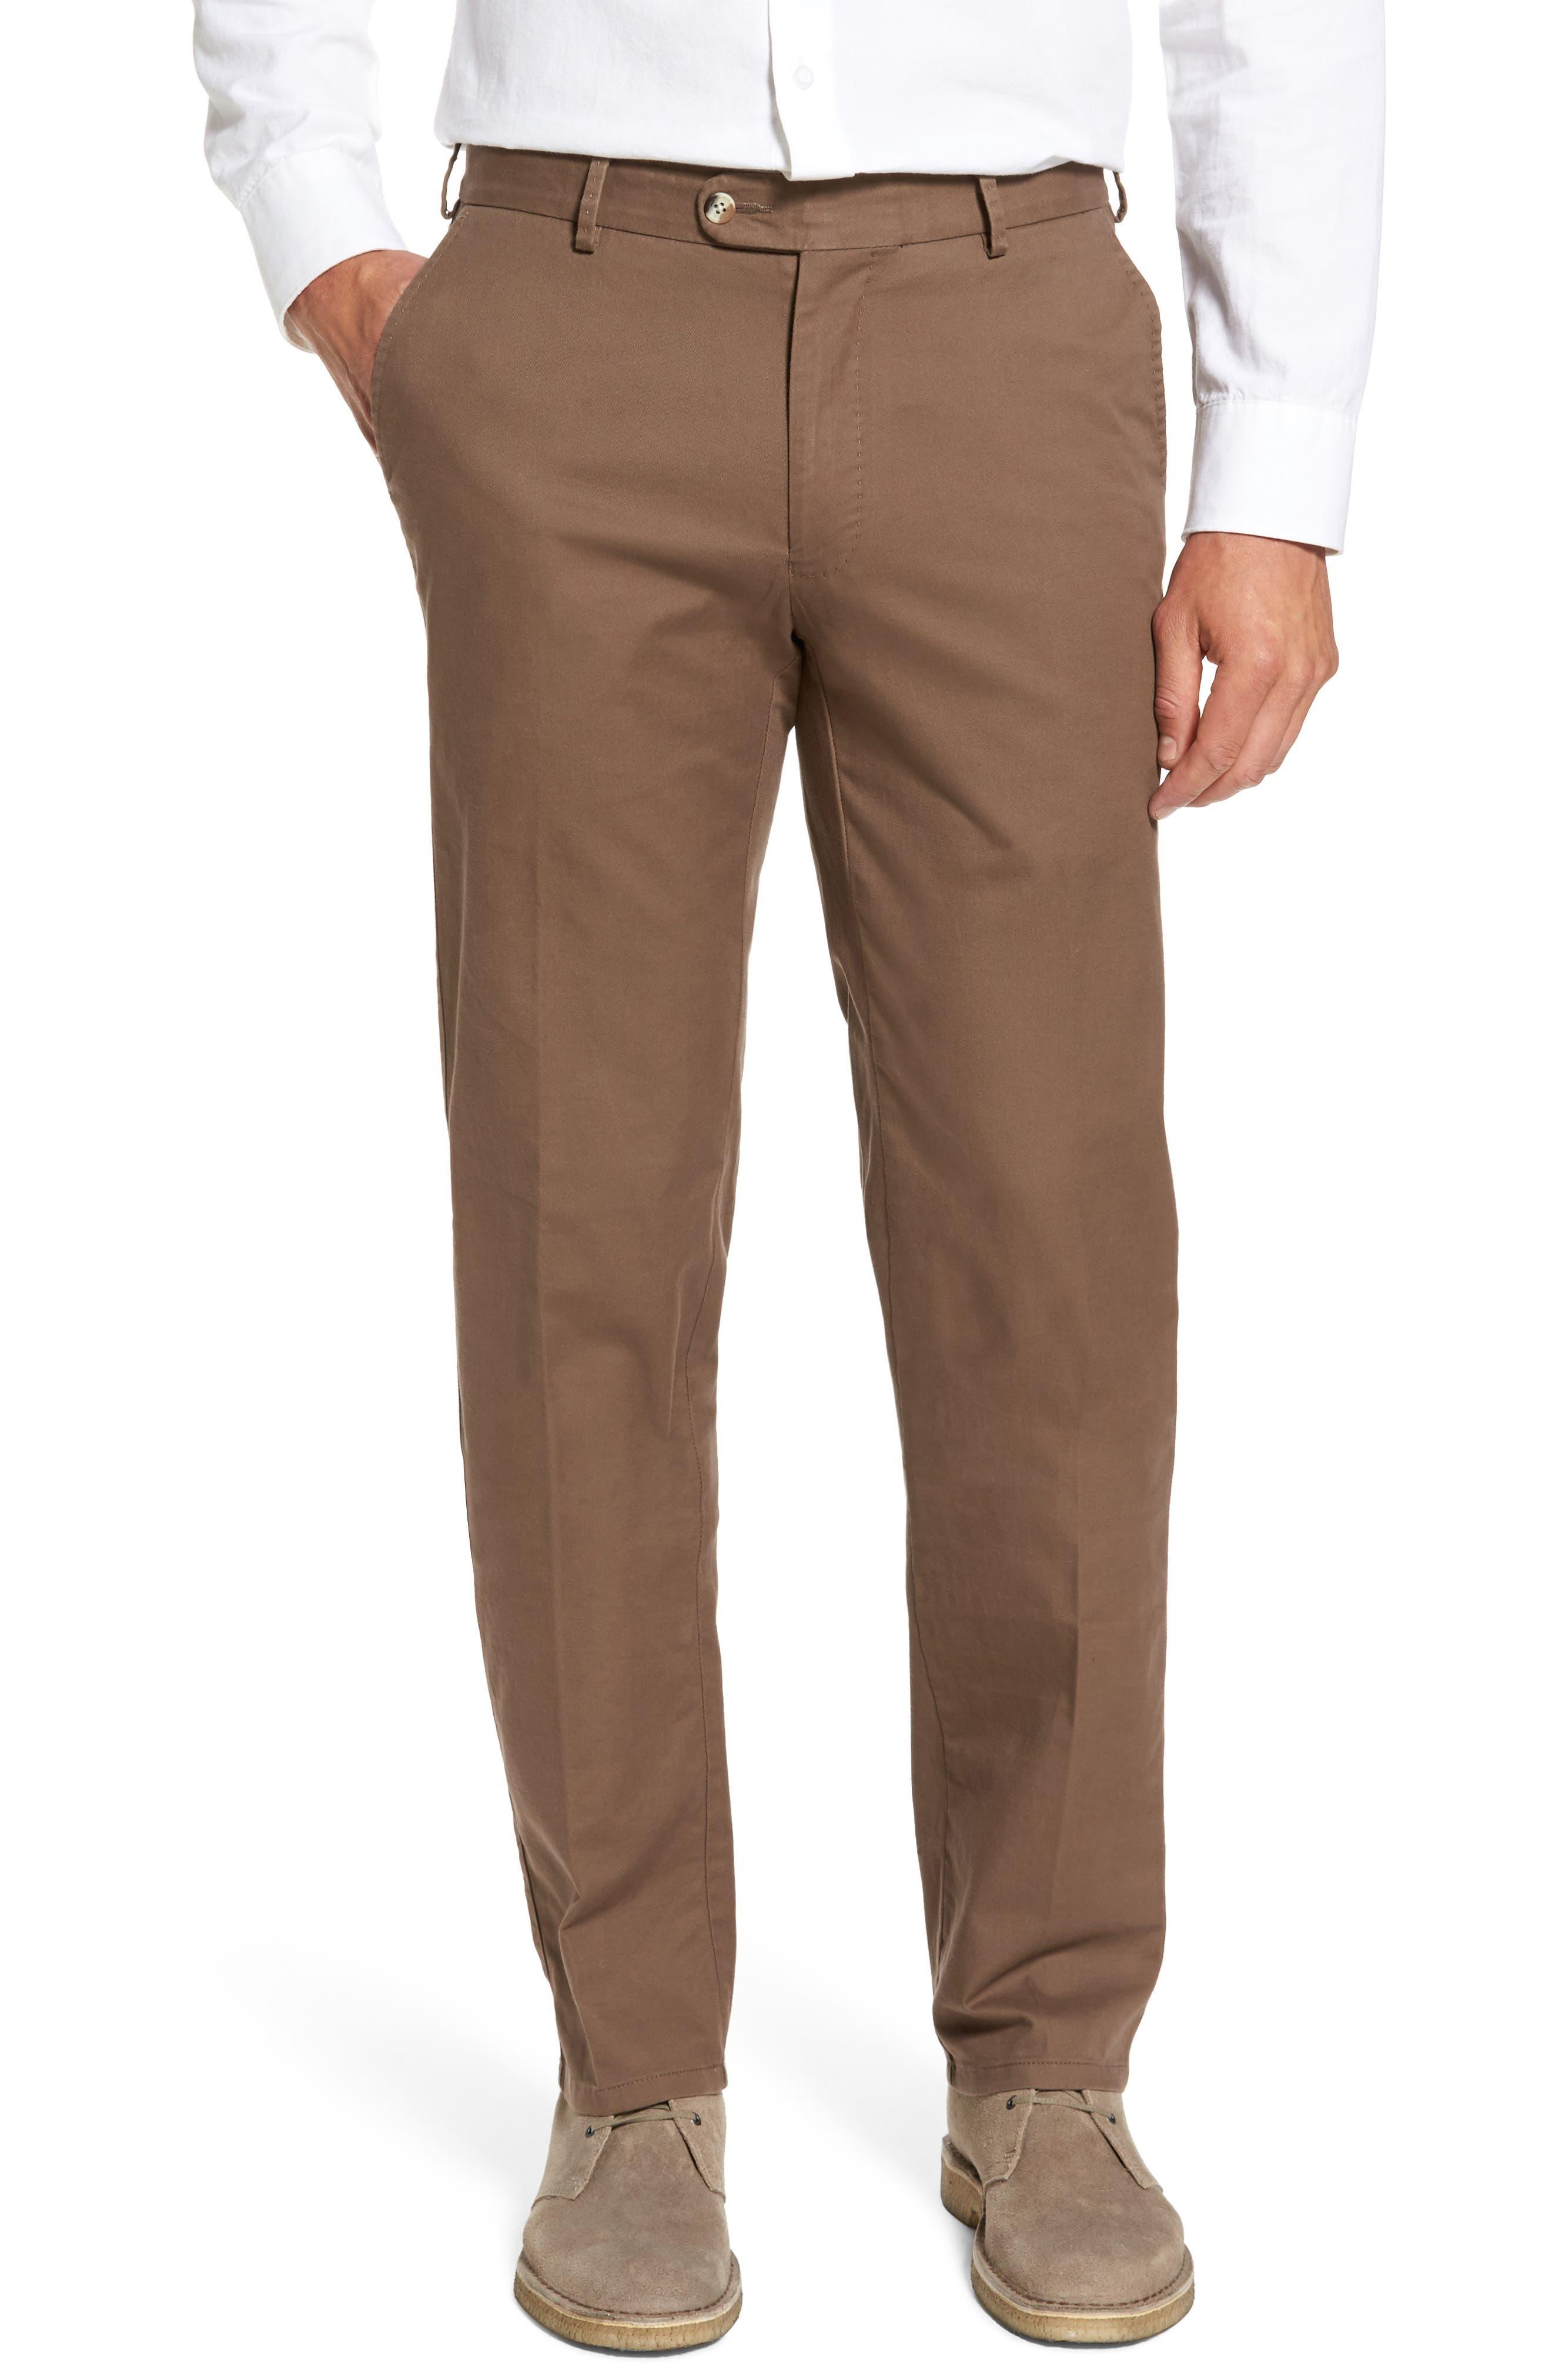 Chocolate Brown Dress Pants dBmWn2nq